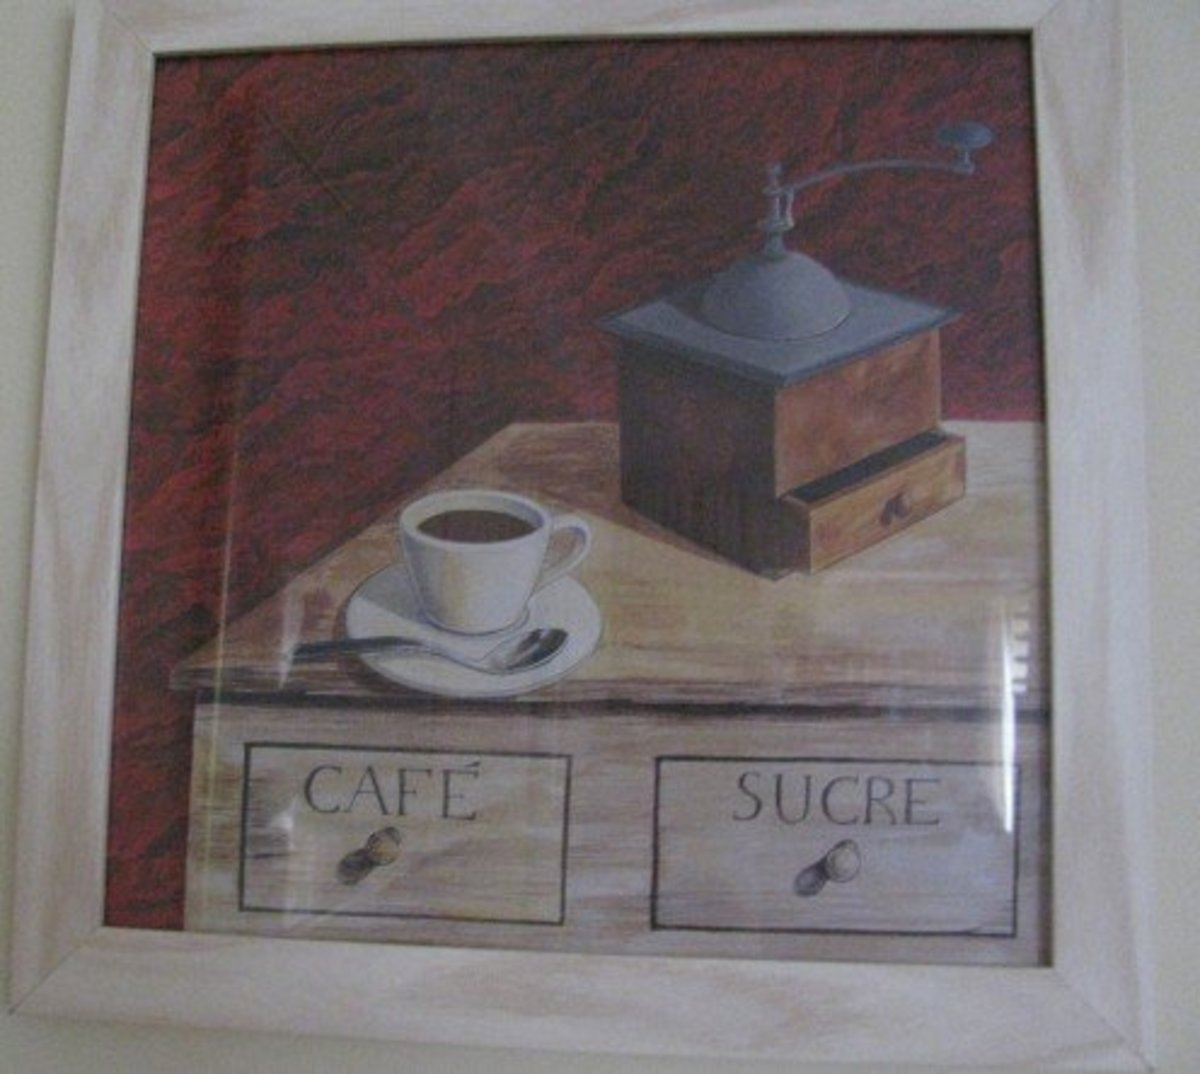 An old-fashioned coffee grinder.  Do you take sugar?